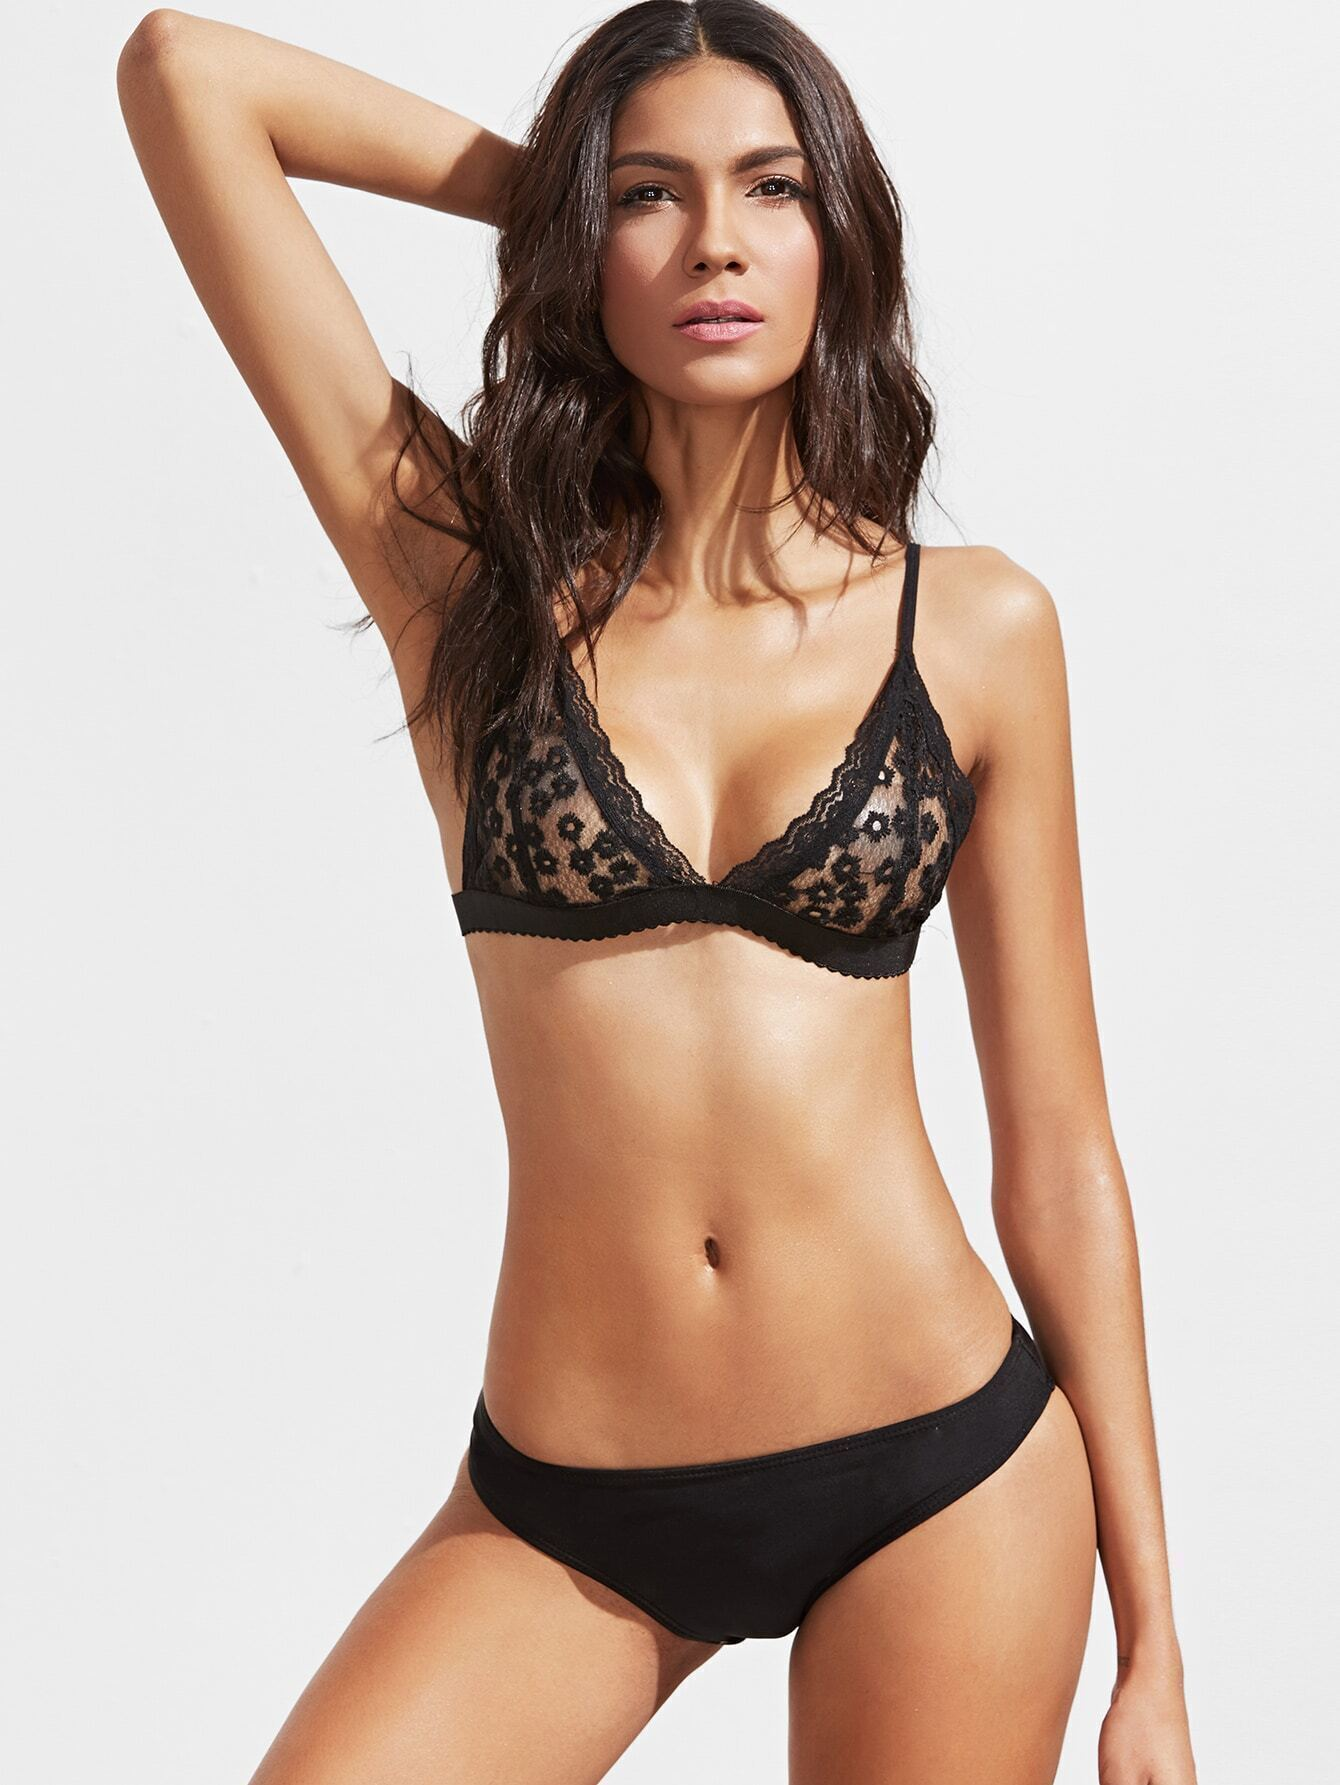 bb05bd2fd237b Black Triangle Floral Lace Bralet EmmaCloth-Women Fast Fashion Online